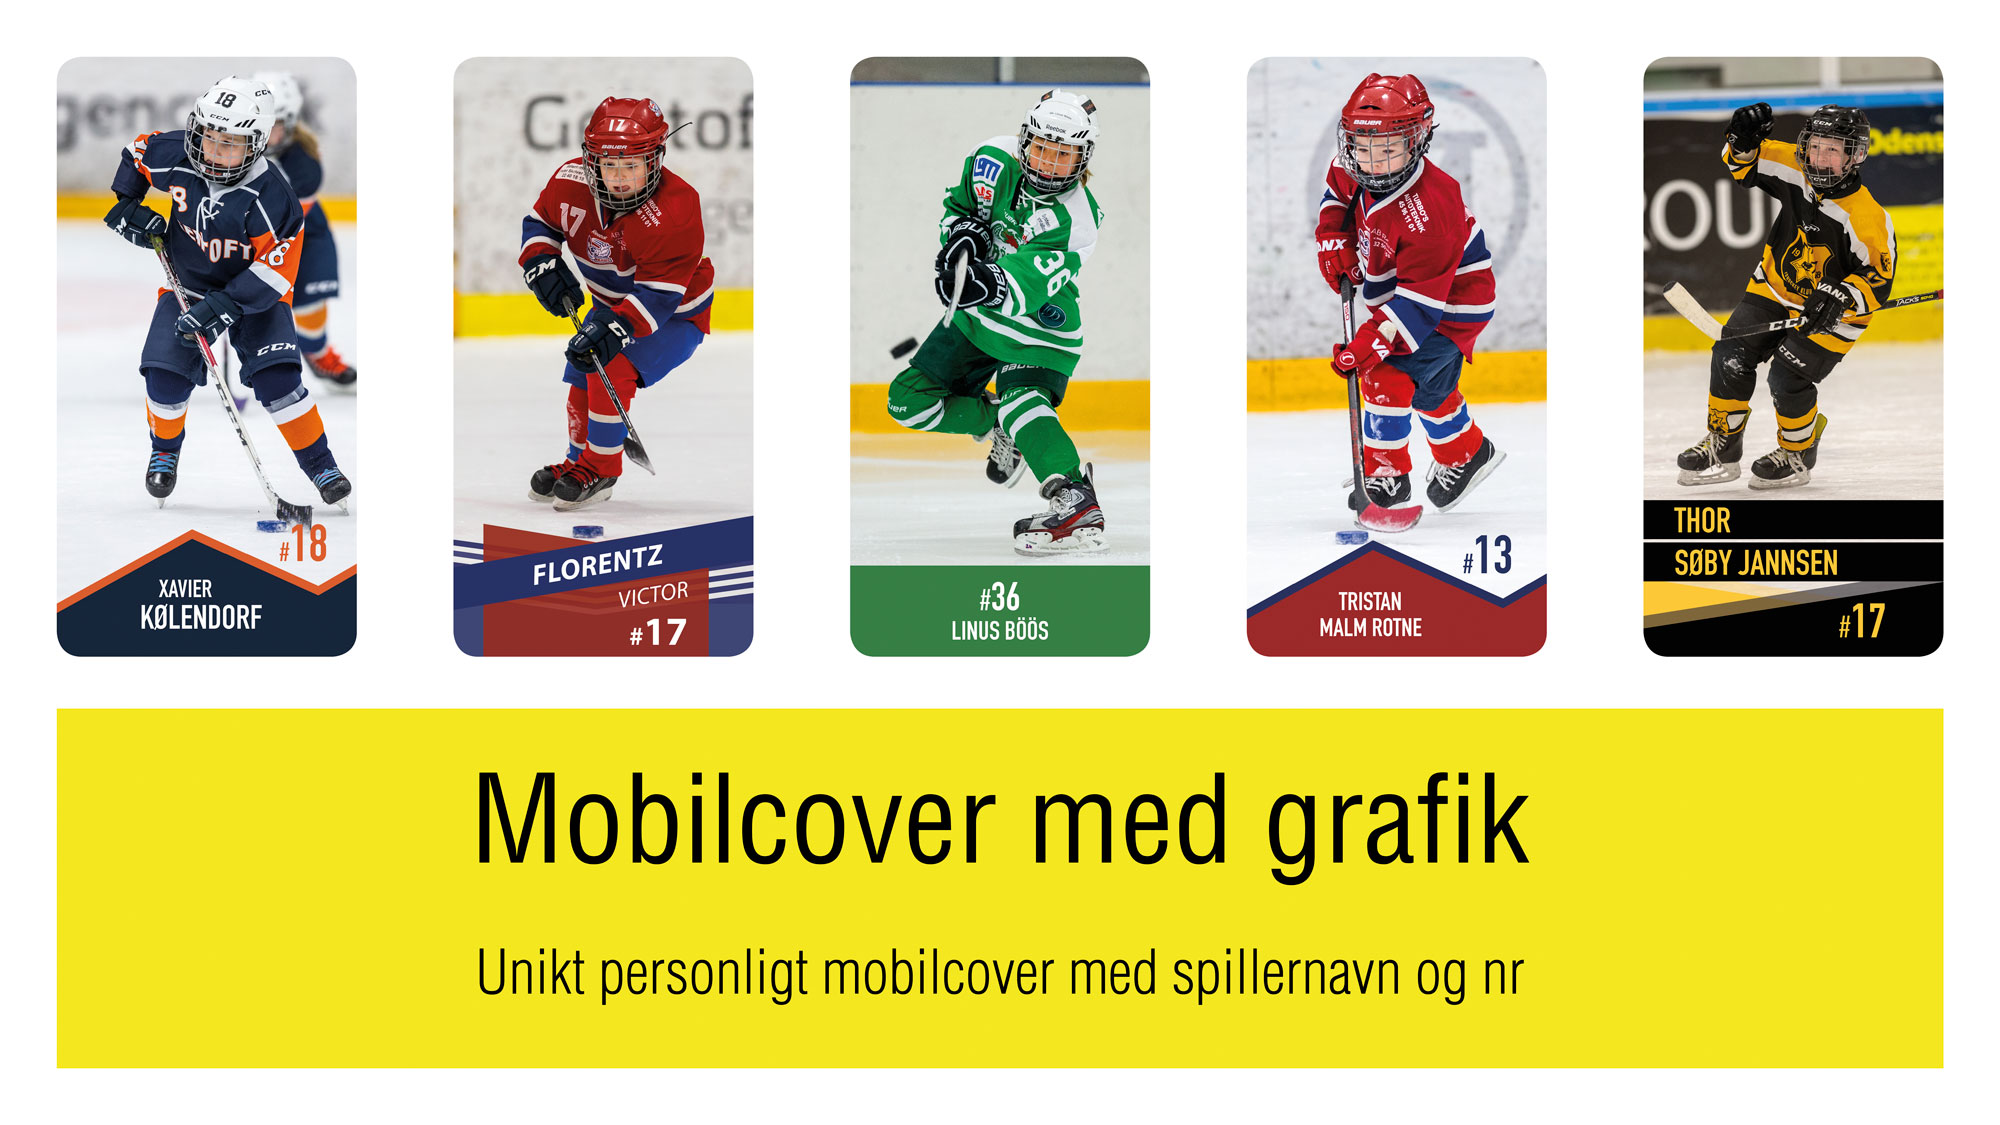 MOBILCOVER MED GRAFIK